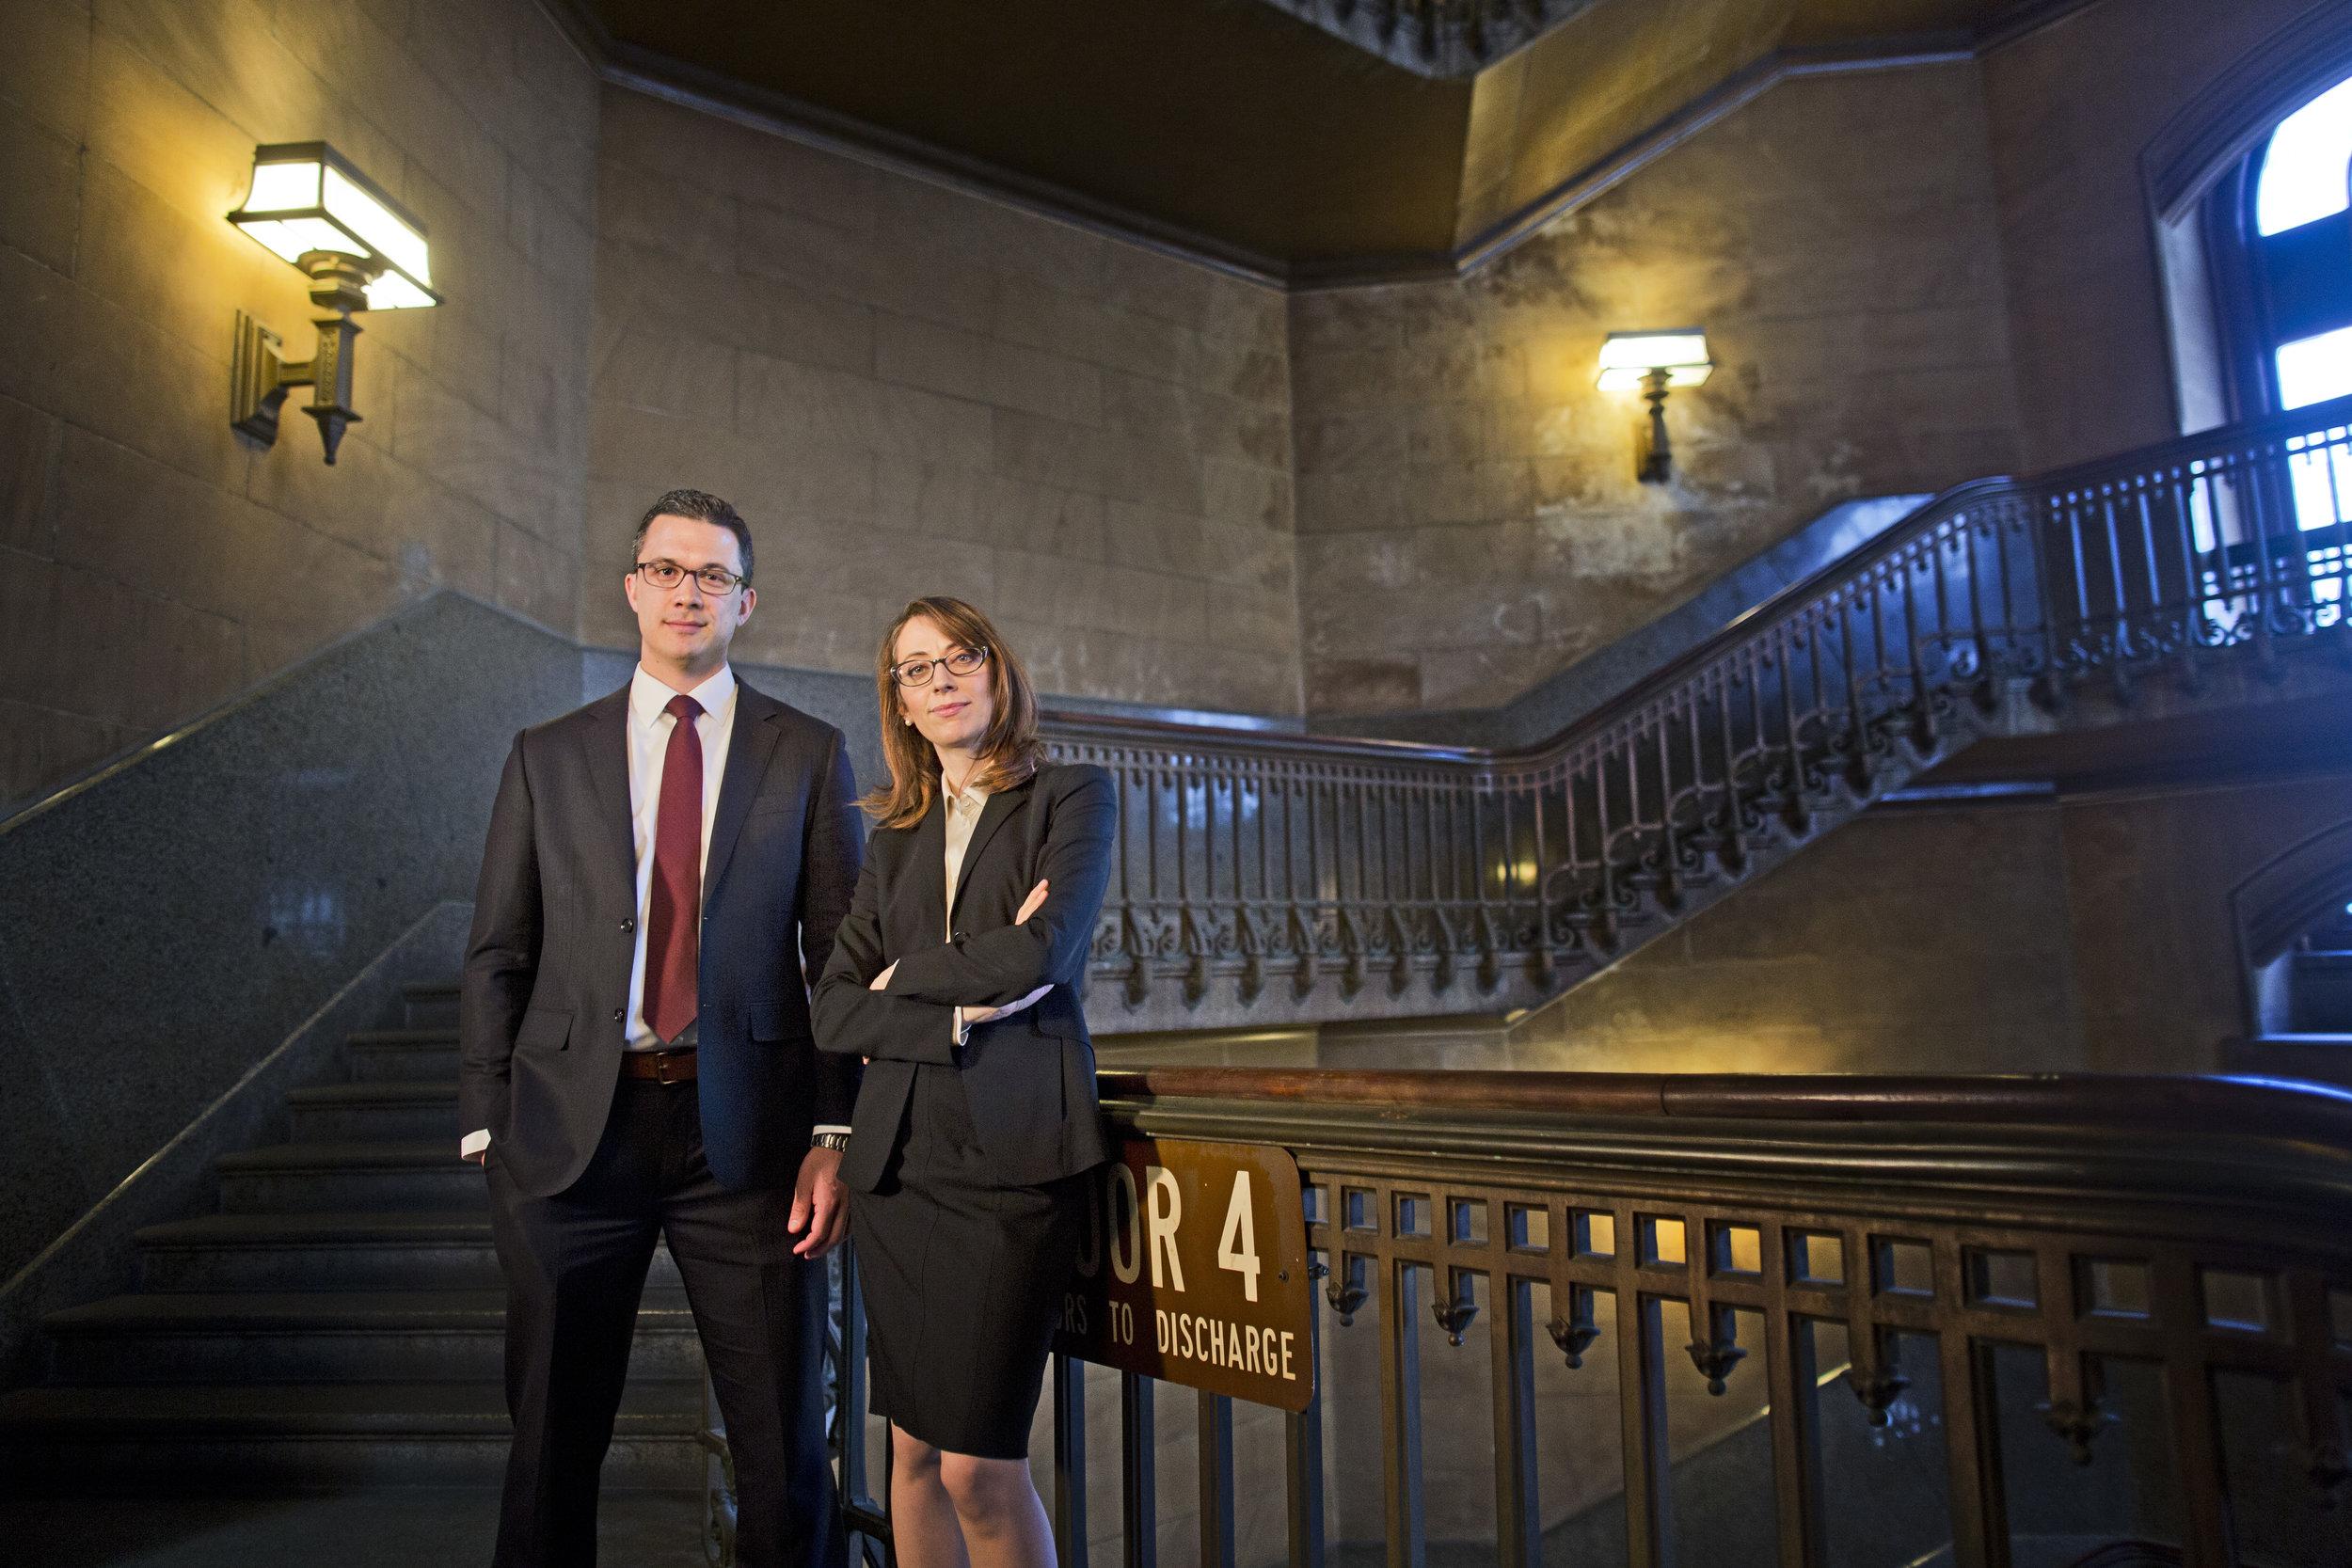 speedy trials in pennsylvania on criminal trials